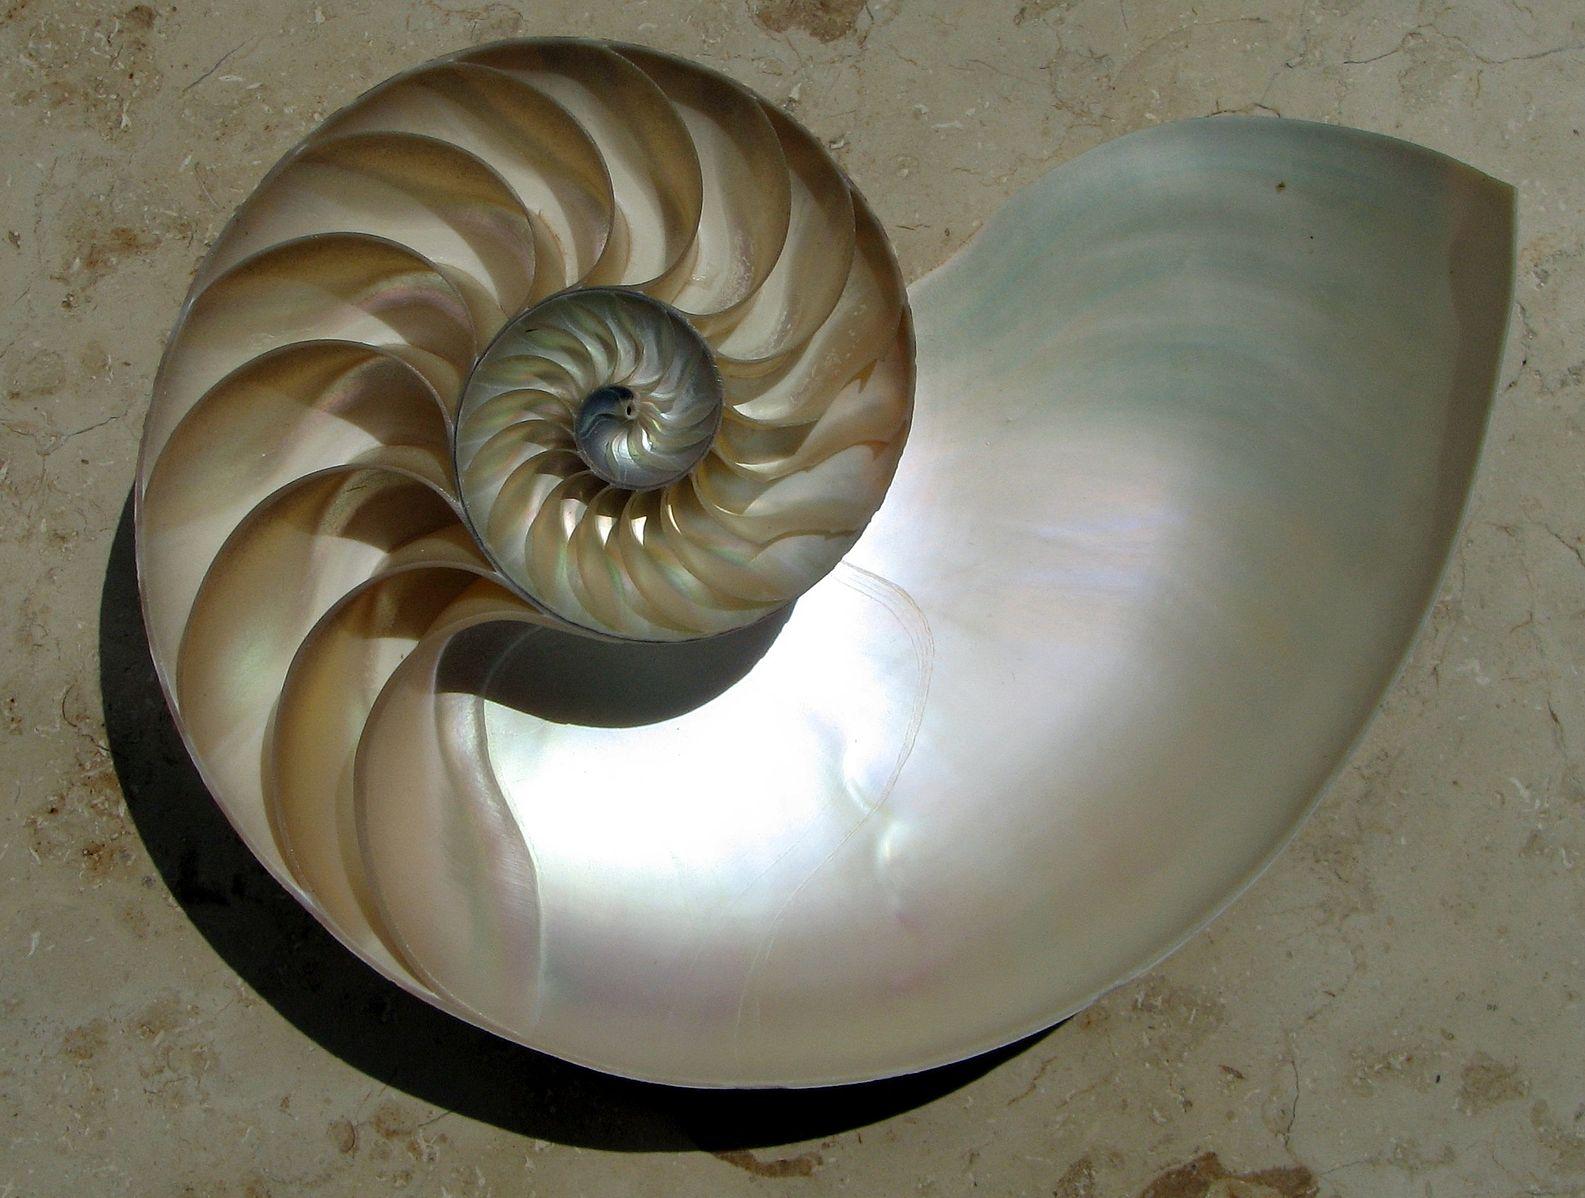 Nautilus shell; Wikpedia